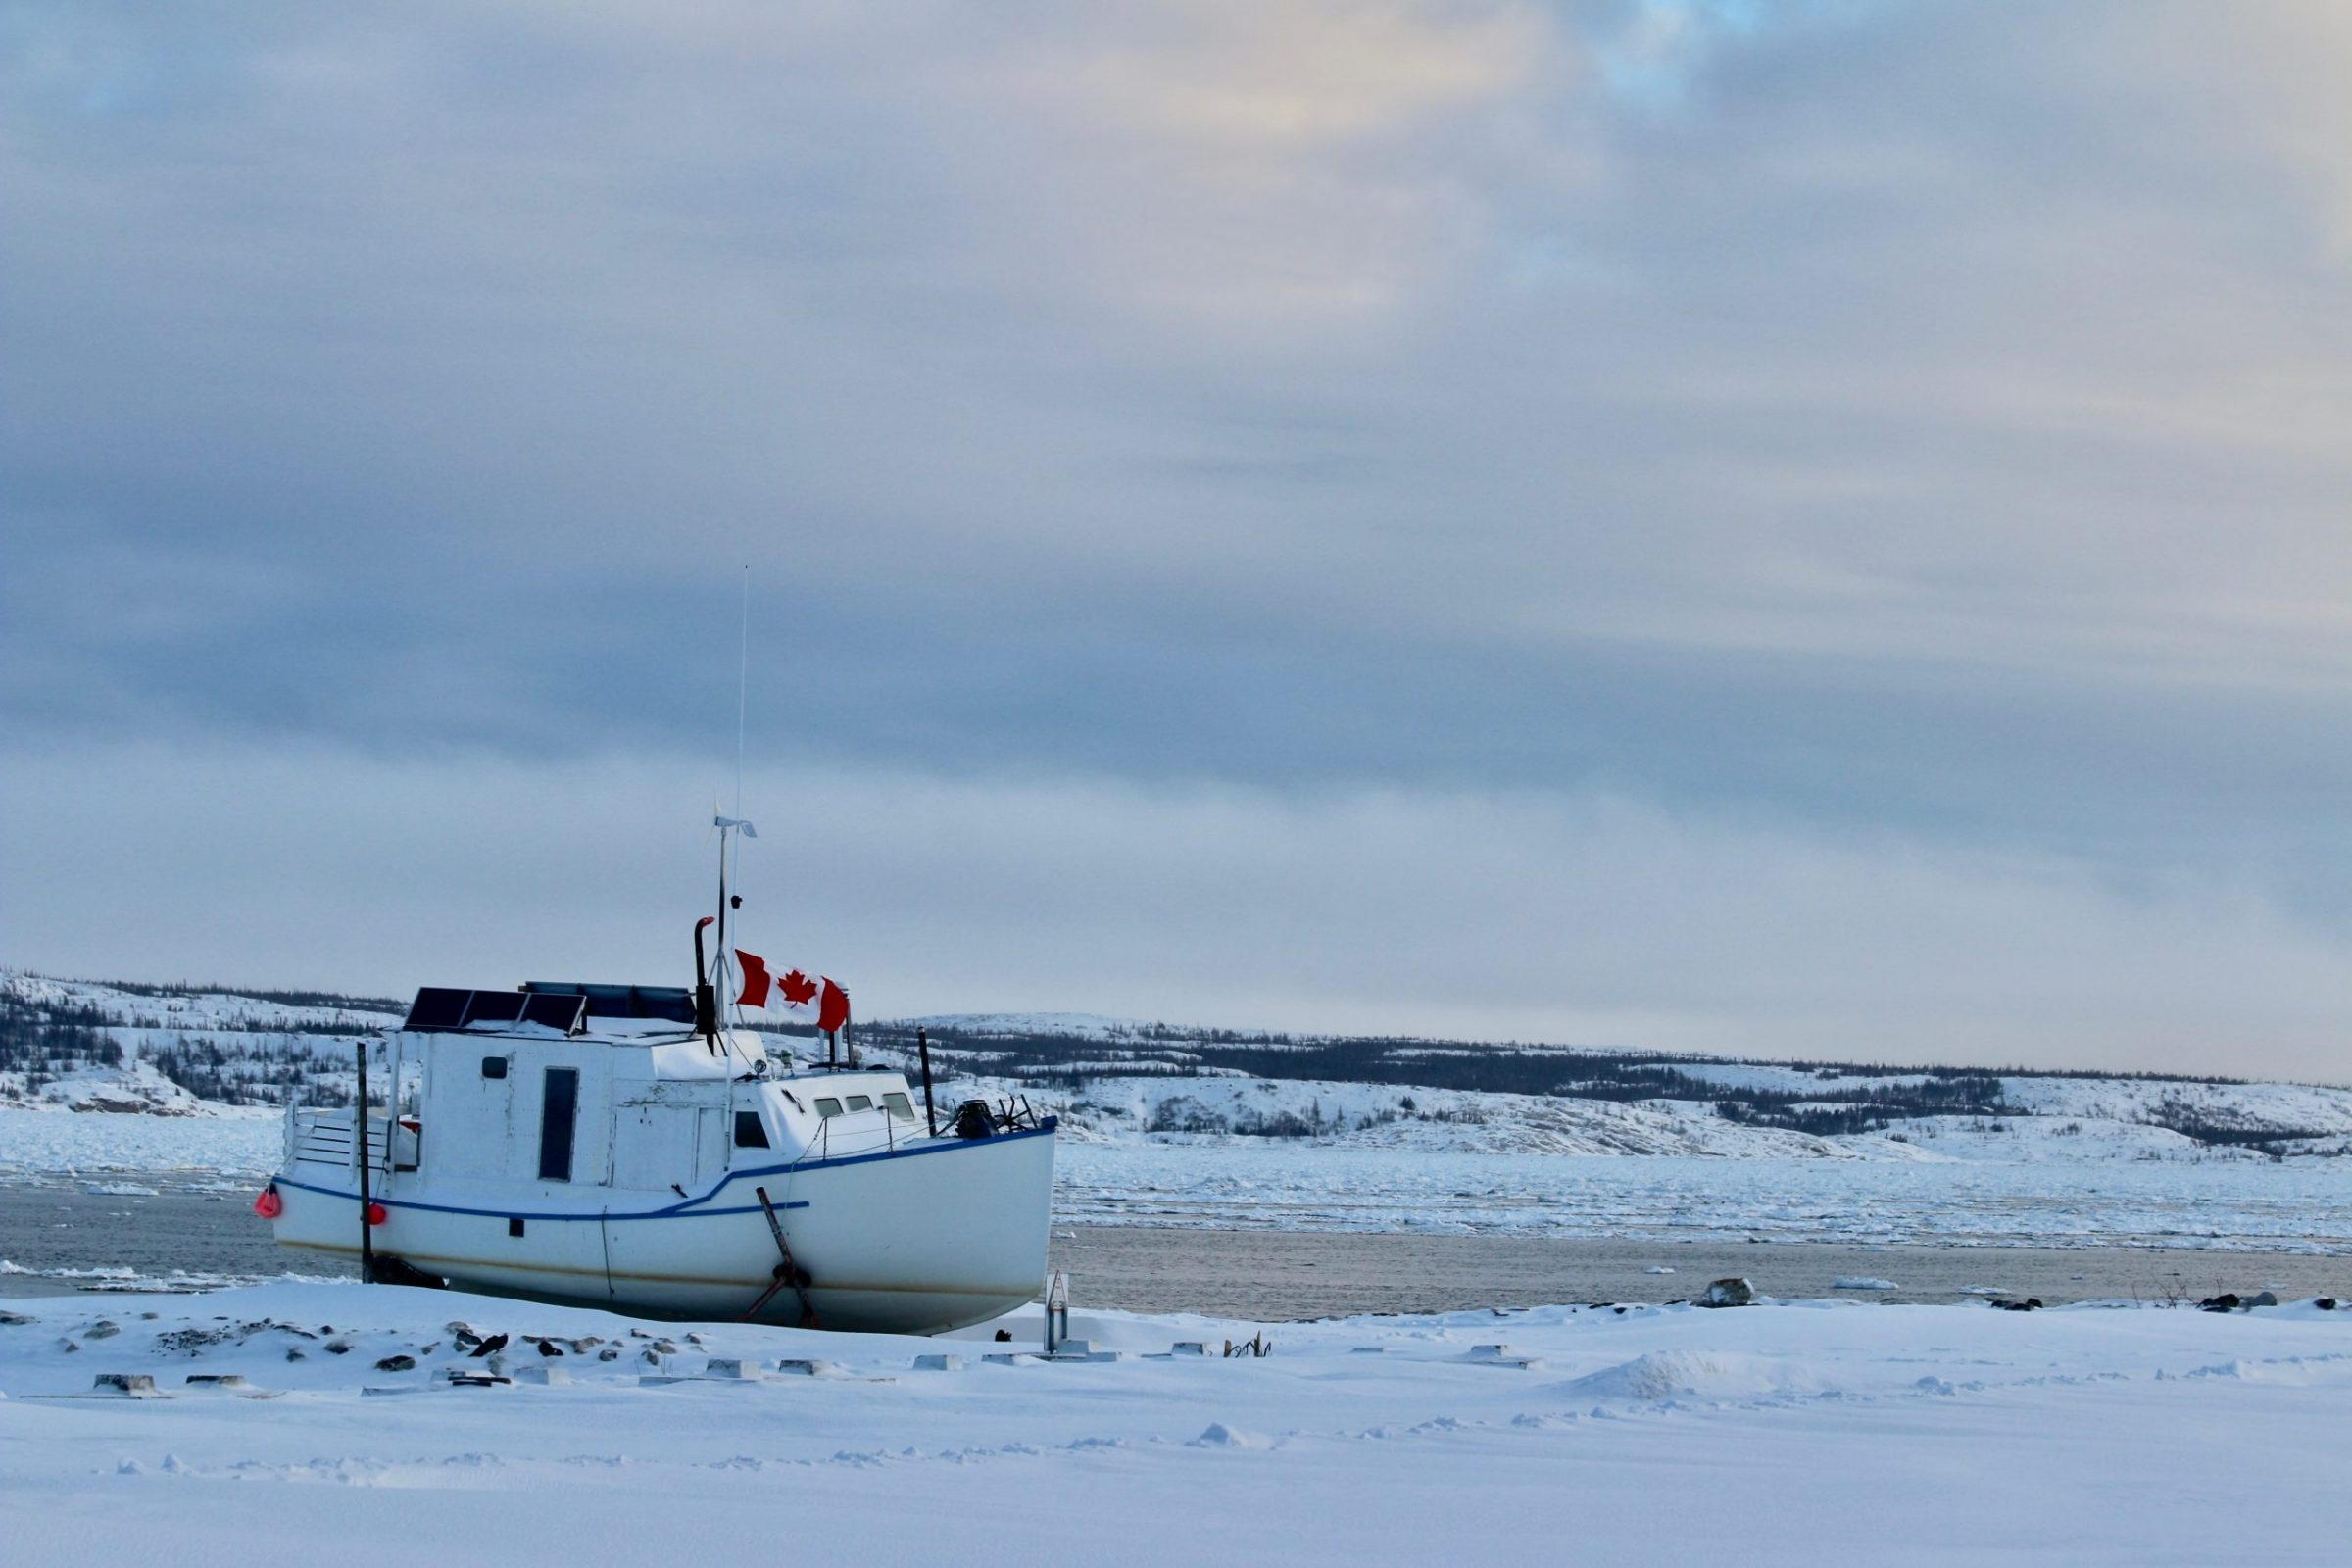 "A boat sits on the banks of the Koksoak River near Kuujjuaq Jan. 18. ""Super late into the season, and still, the Kuujjuaq River isn't frozen,"" writes Malaya Qaunirq Chapman. (Photo by Malaya Qaunirq Chapman)"